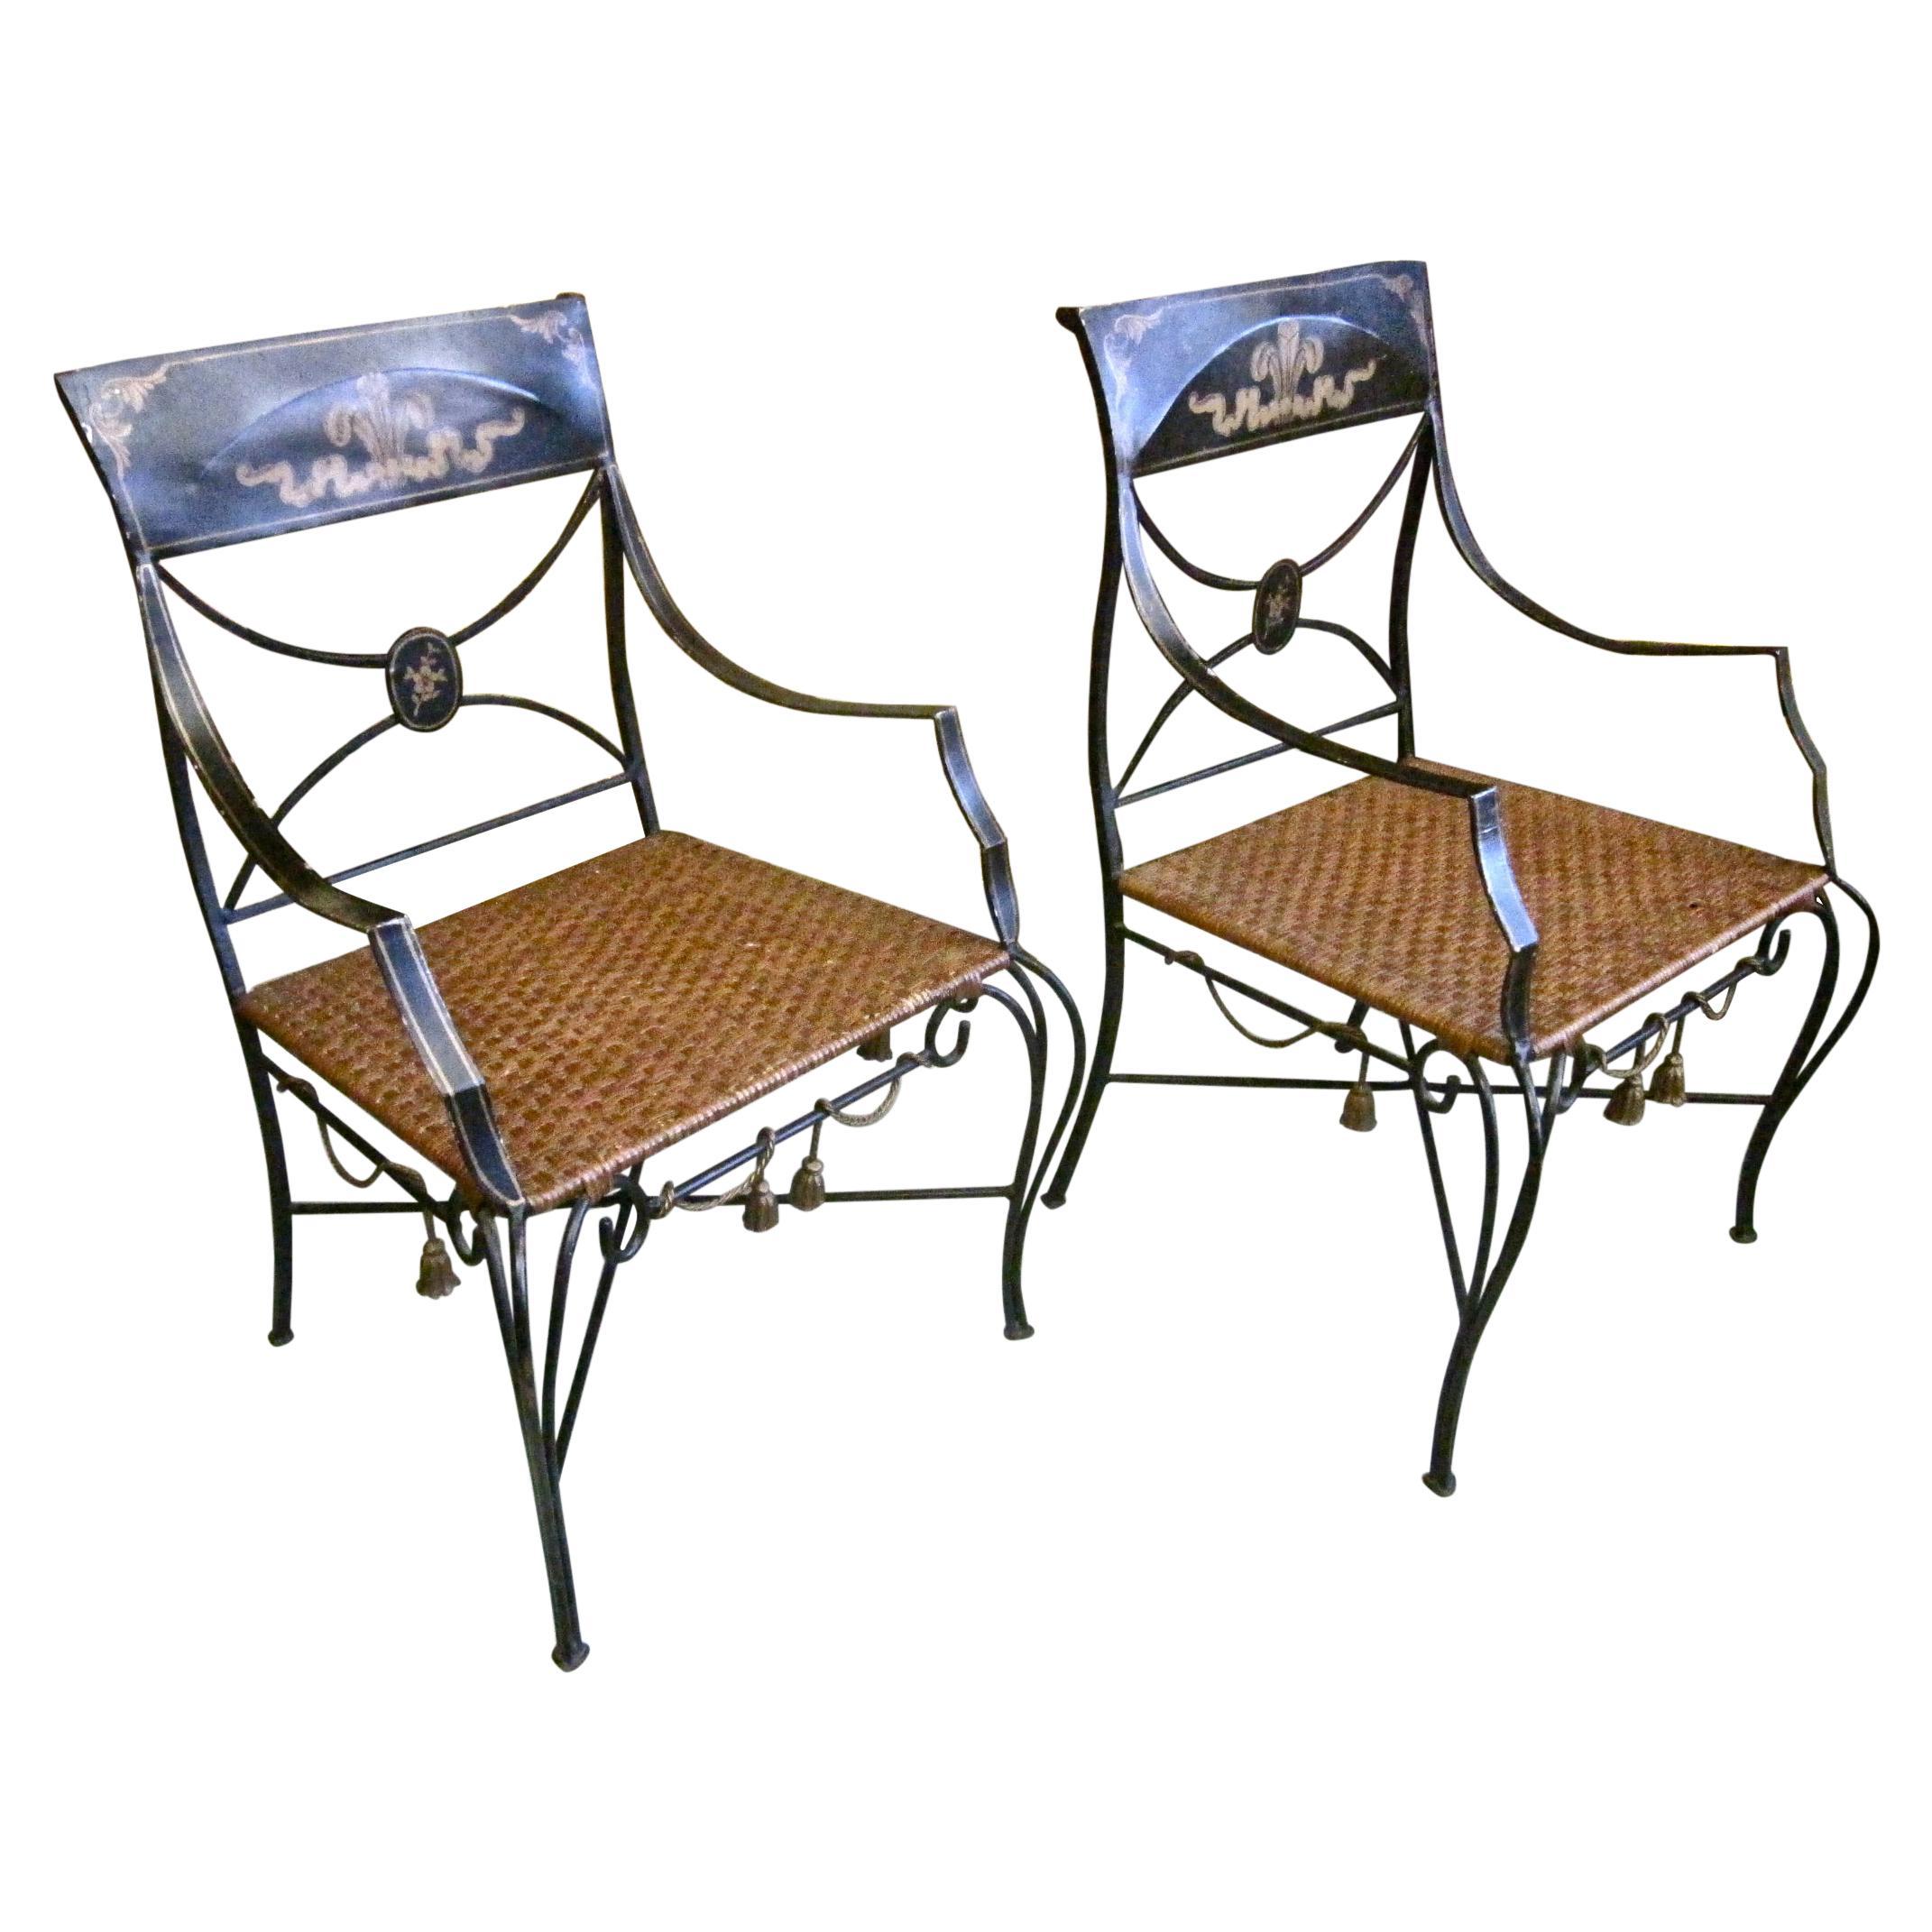 Pair of Midcentury Italian Iron Chairs Attributed to Tomaso Bruzzi